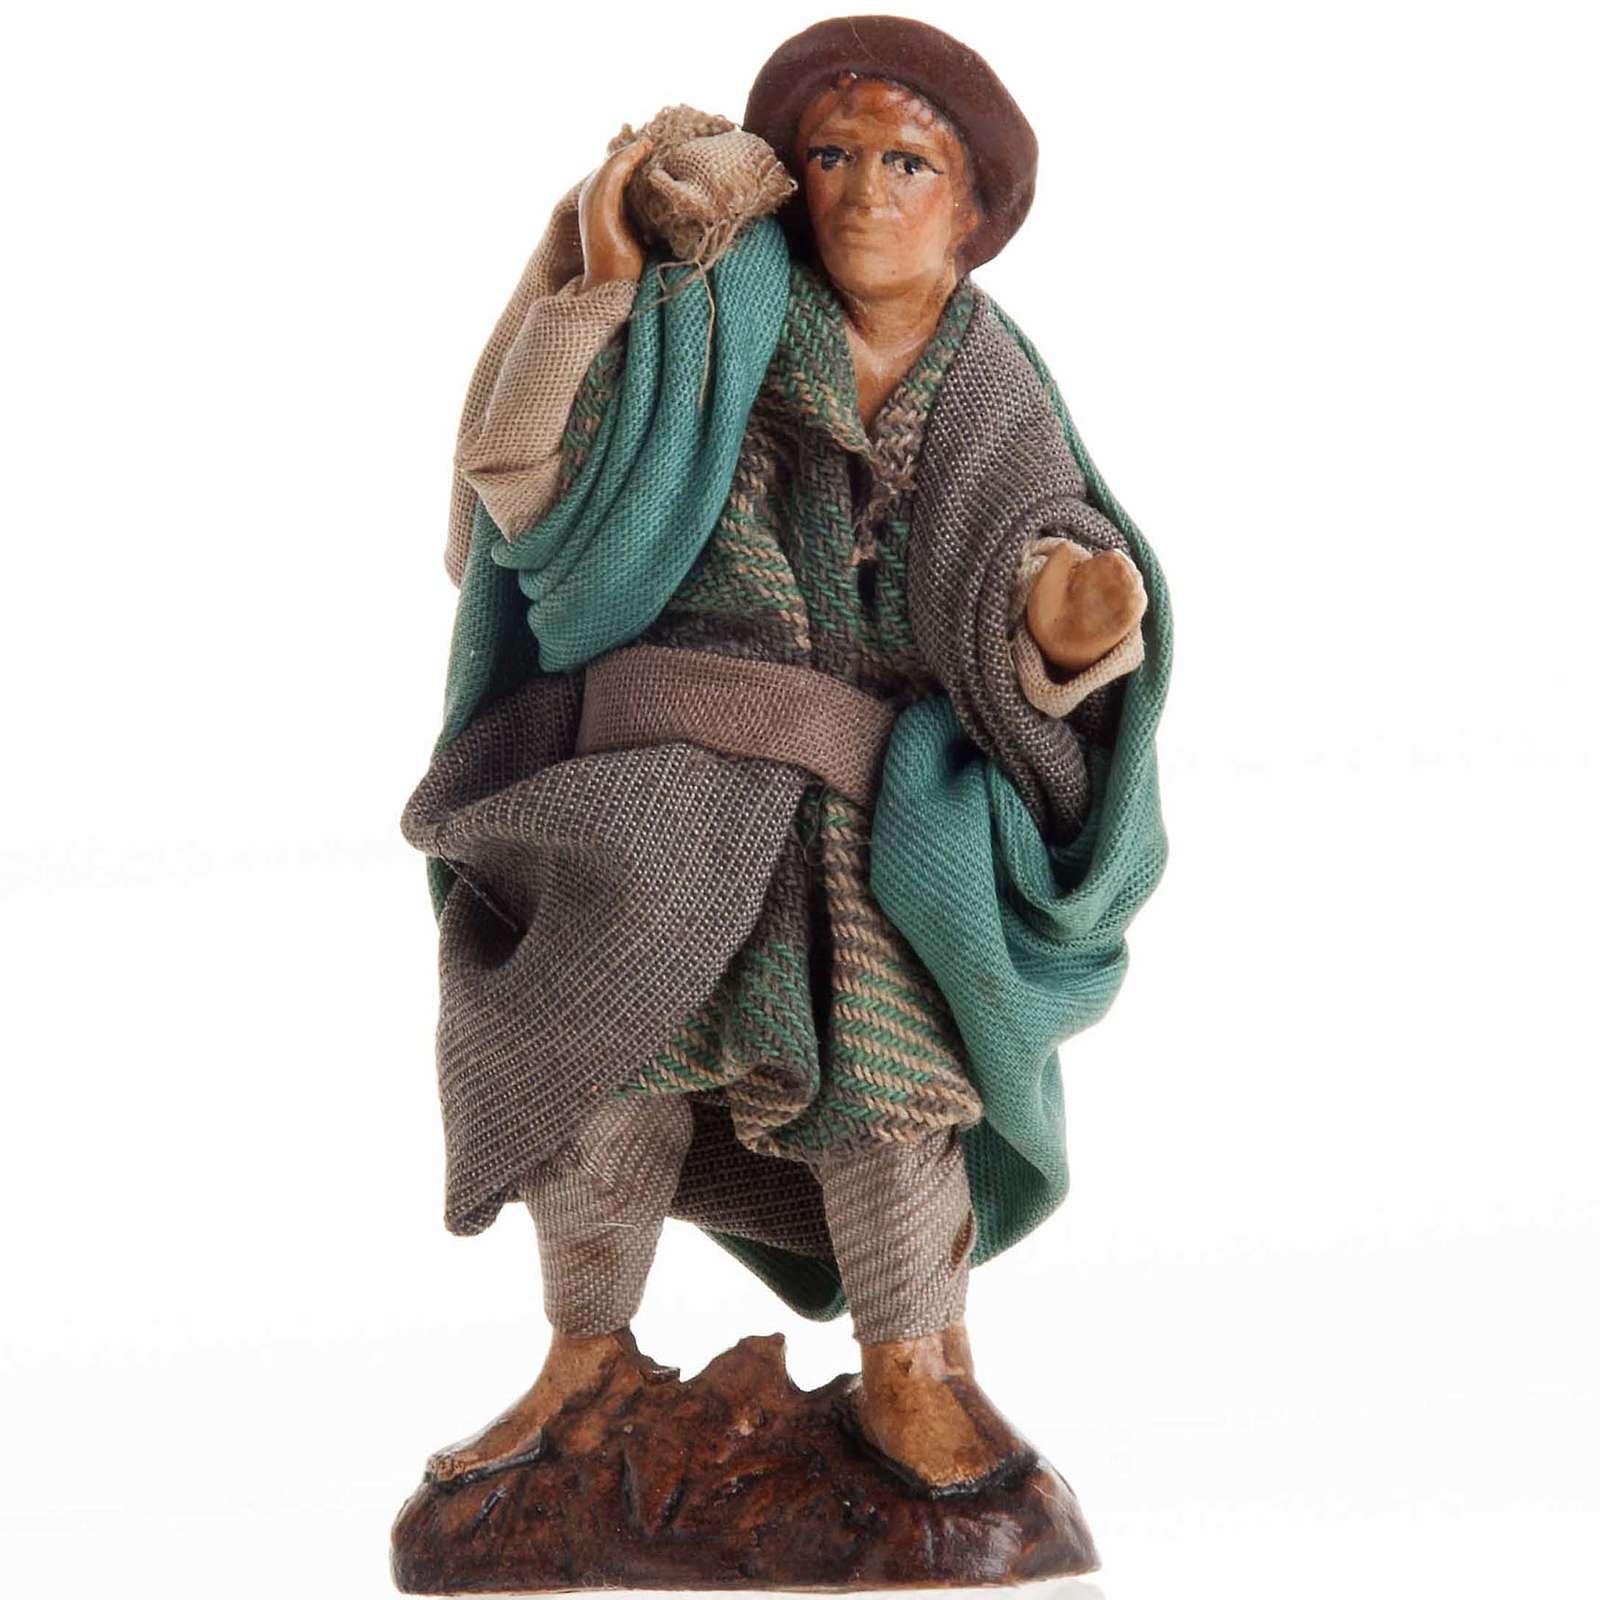 Neapolitan nativity figurine, man with sack 8cm 4